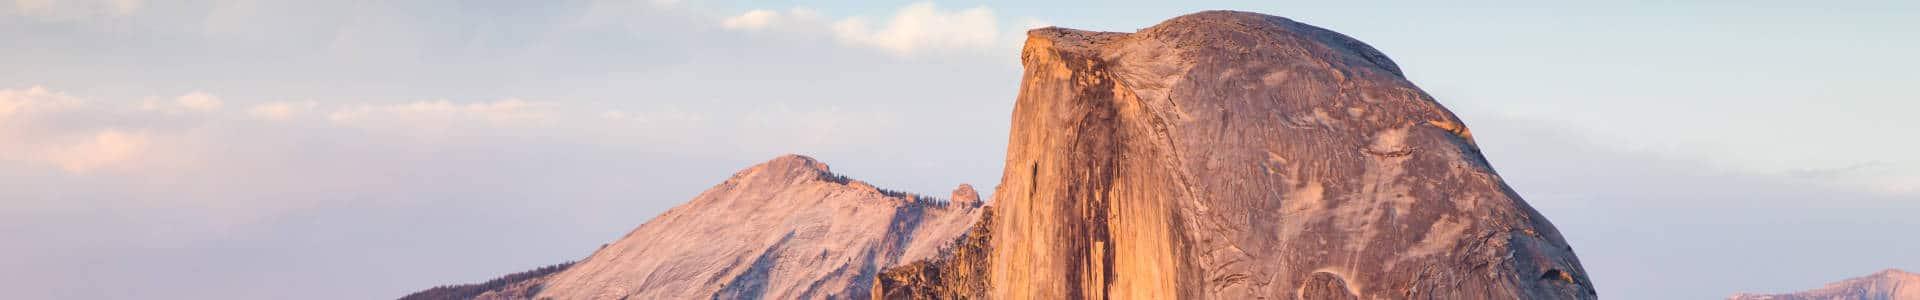 berginstinct-wanderregionen-1920x300